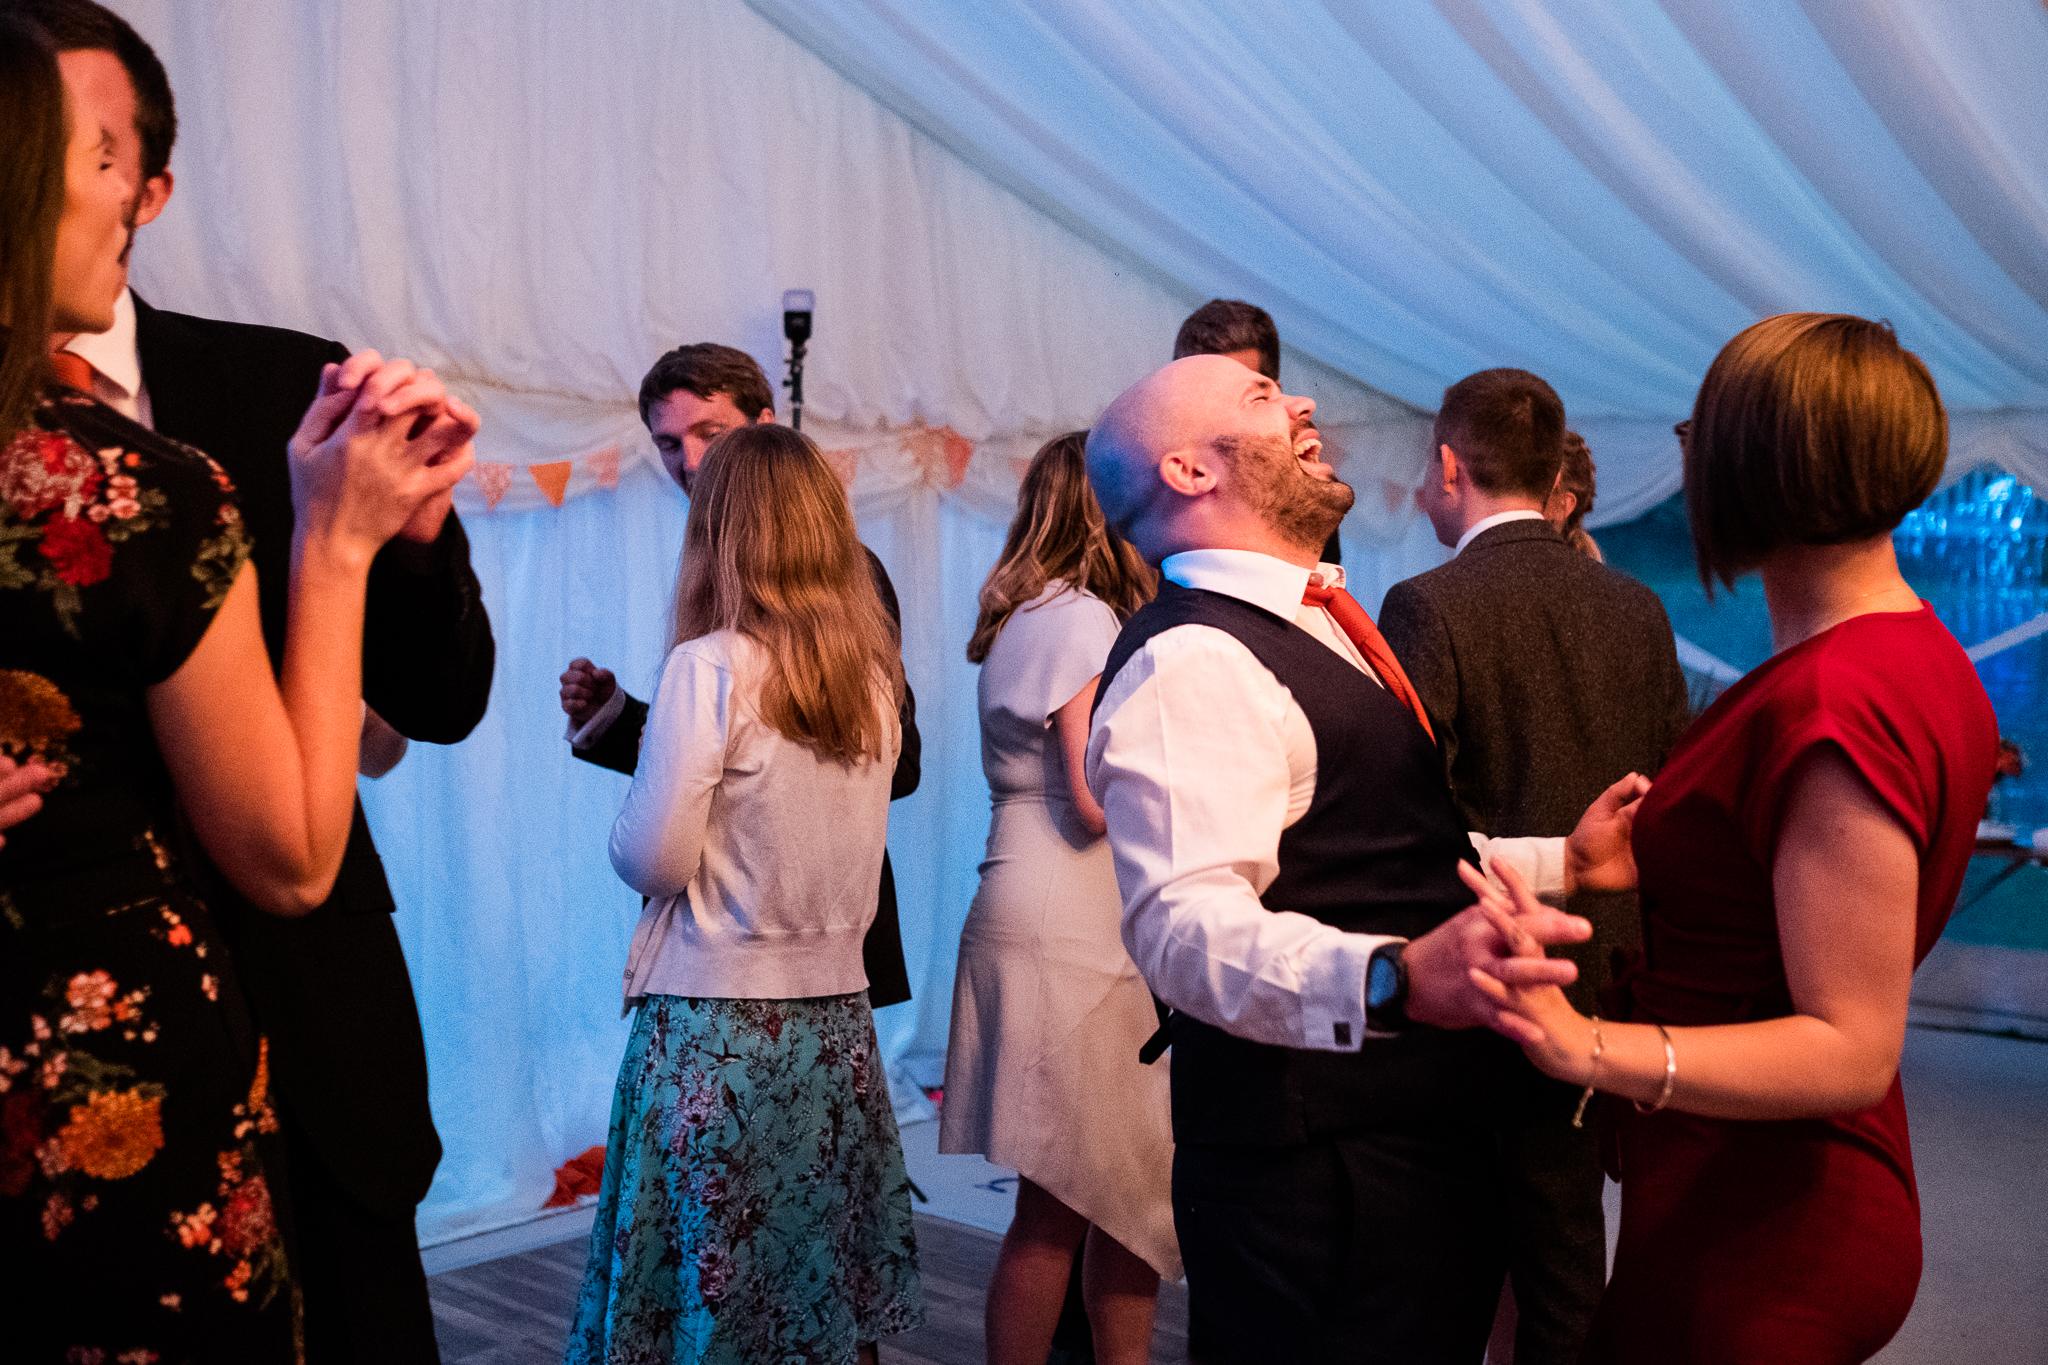 Relaxed Documentary Wedding Photography at The Wizard Inn, Alderley Edge Cheshire - Jenny Harper-86.jpg